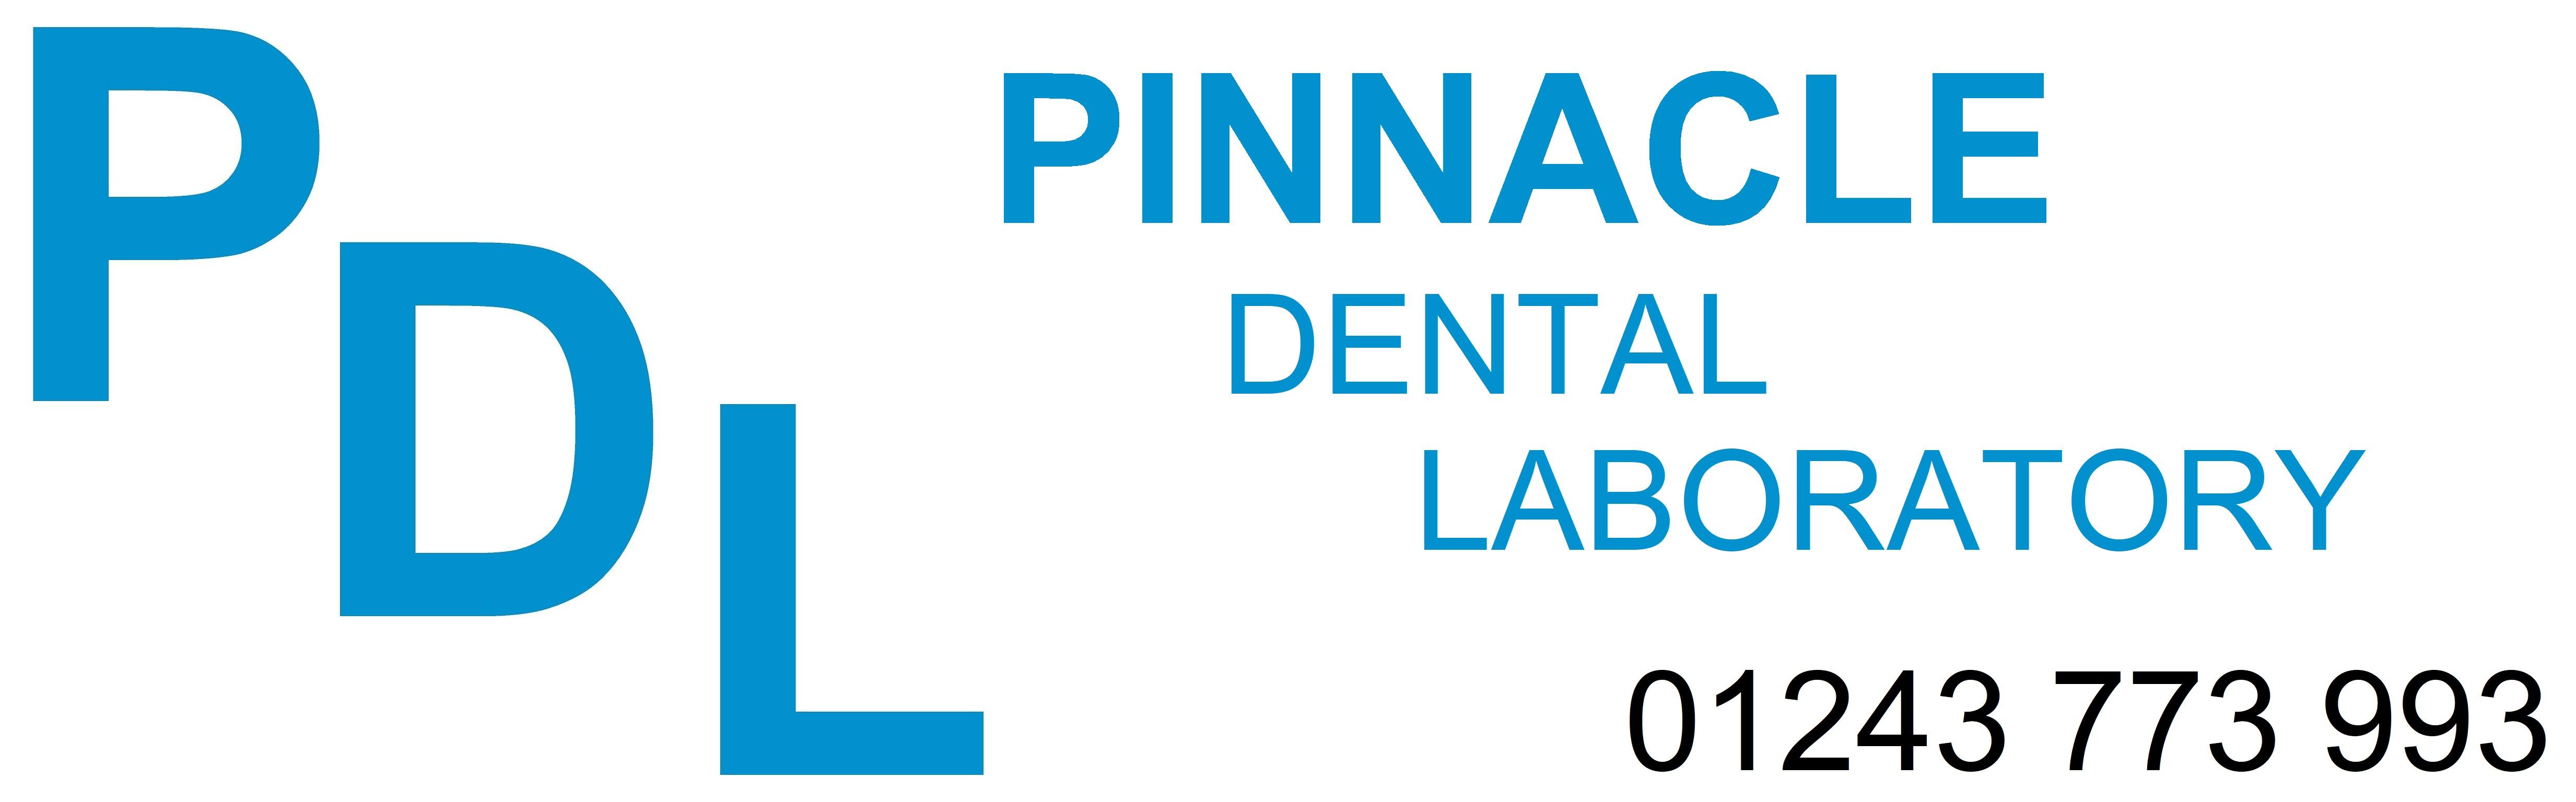 Pinnacle Dental Laboratory